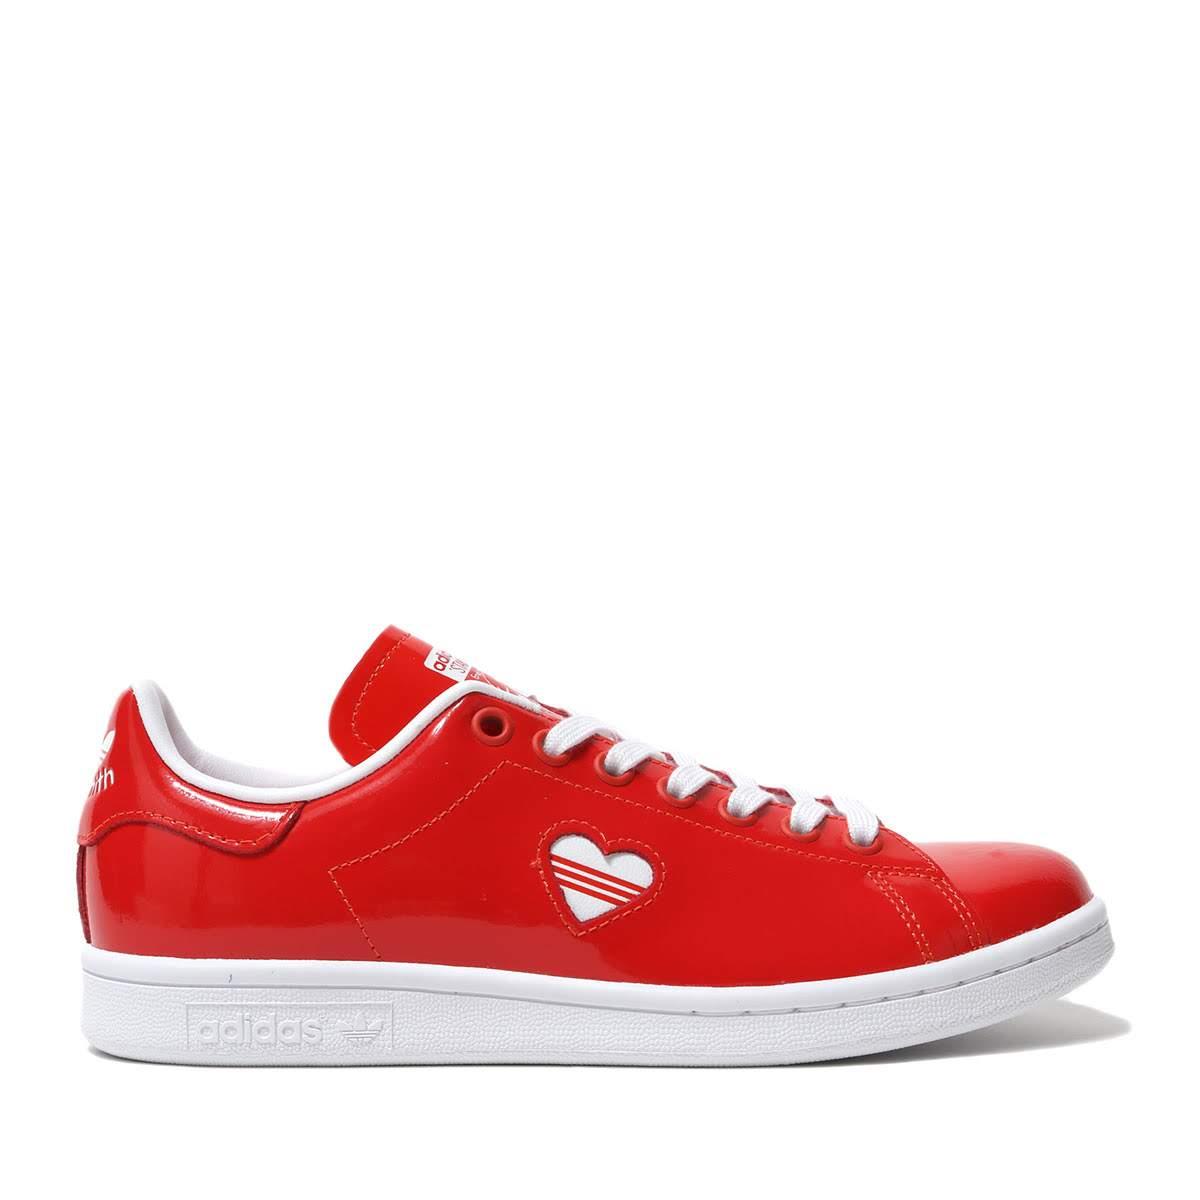 adidas Originals STAN SMITH W(ACTIVE RED/RUNNING WHITE/ACTIVE RED)(アディダスオリジナルス スタンスミス W)【レディース】【スニーカー】【19SS-I】